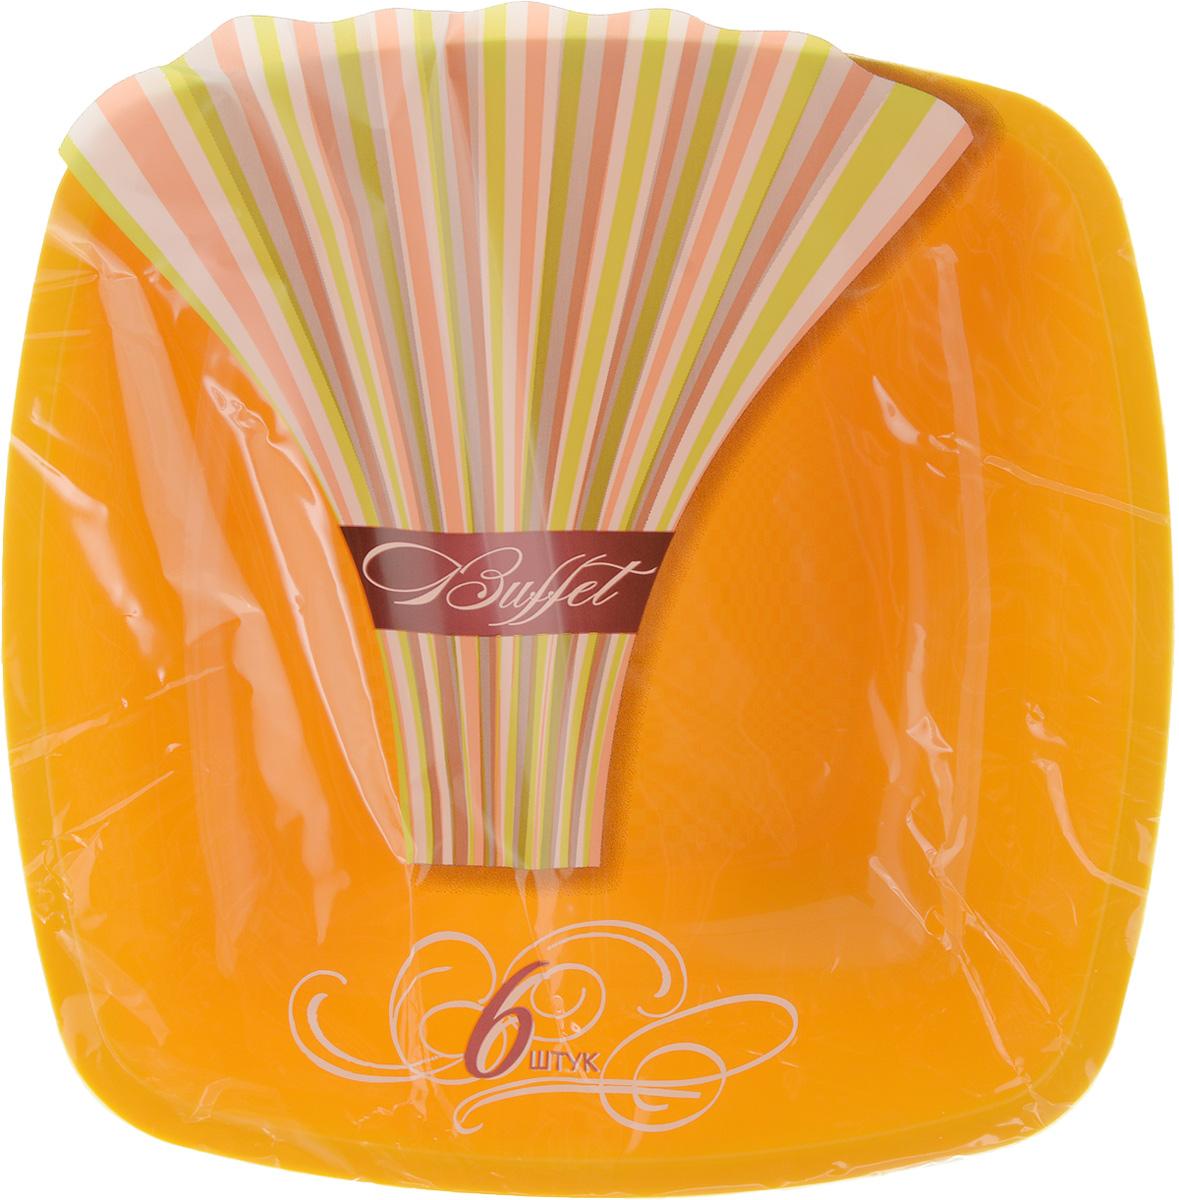 Набор одноразовых глубоких тарелок Buffet, цвет: желтый, 18 х 18 см, 6 шт мистерия buffet красная